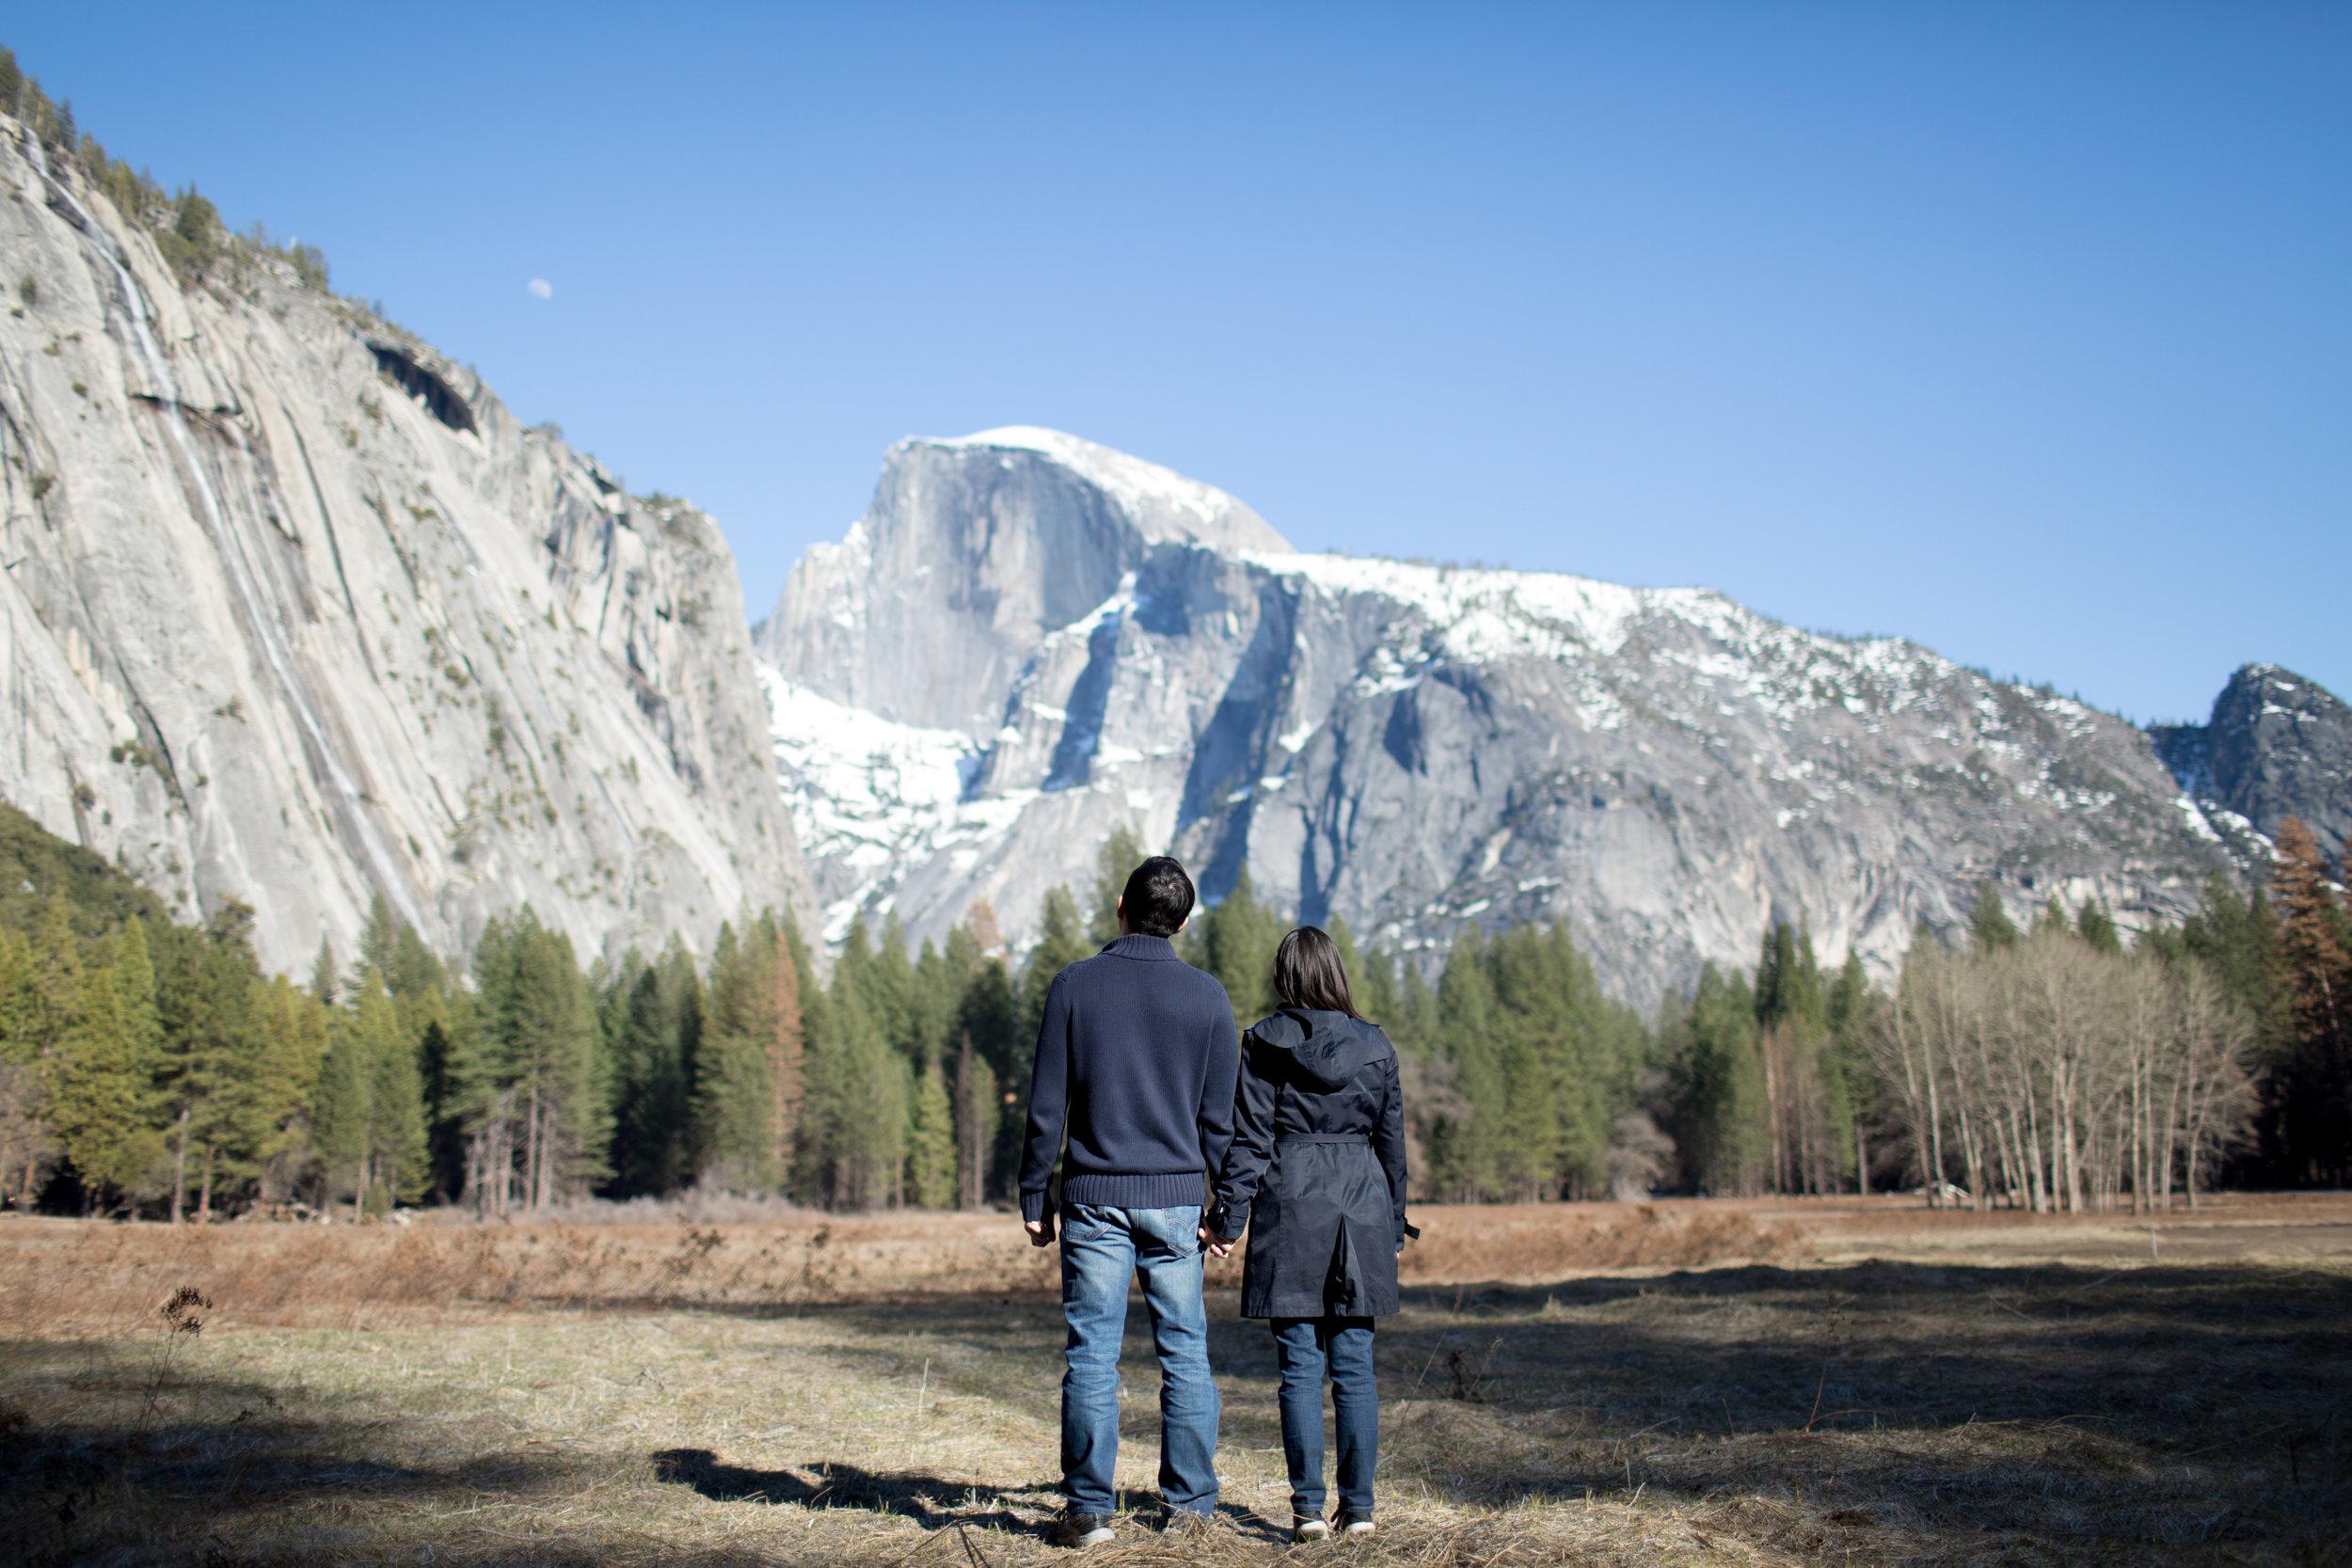 Yosemite_Day1_YosemiteValley-047.jpg